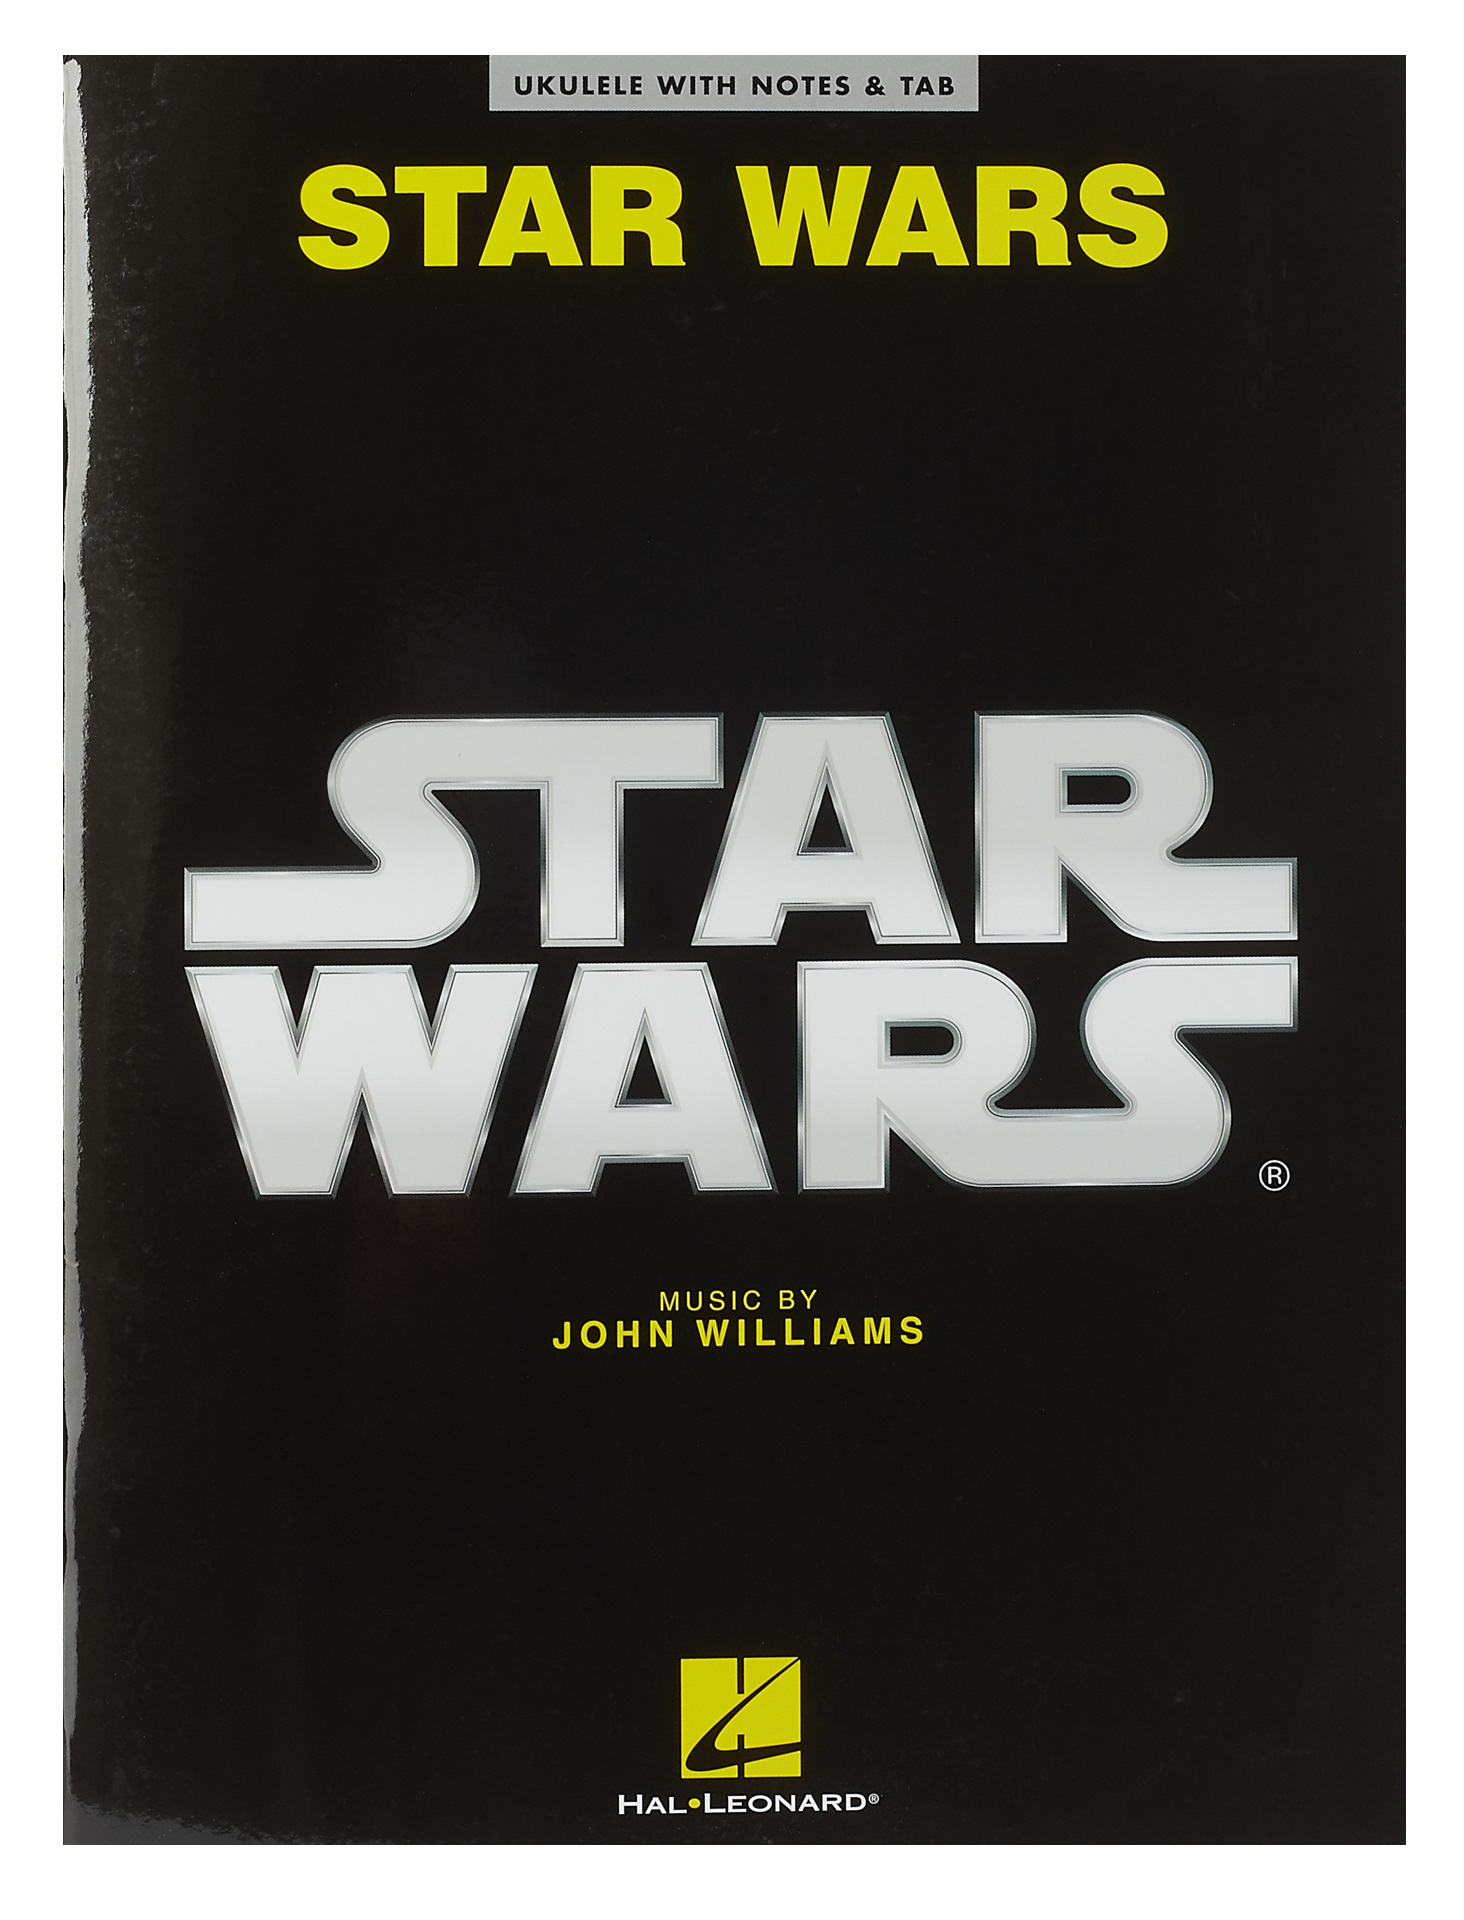 MS John Williams: Star Wars - Ukulele